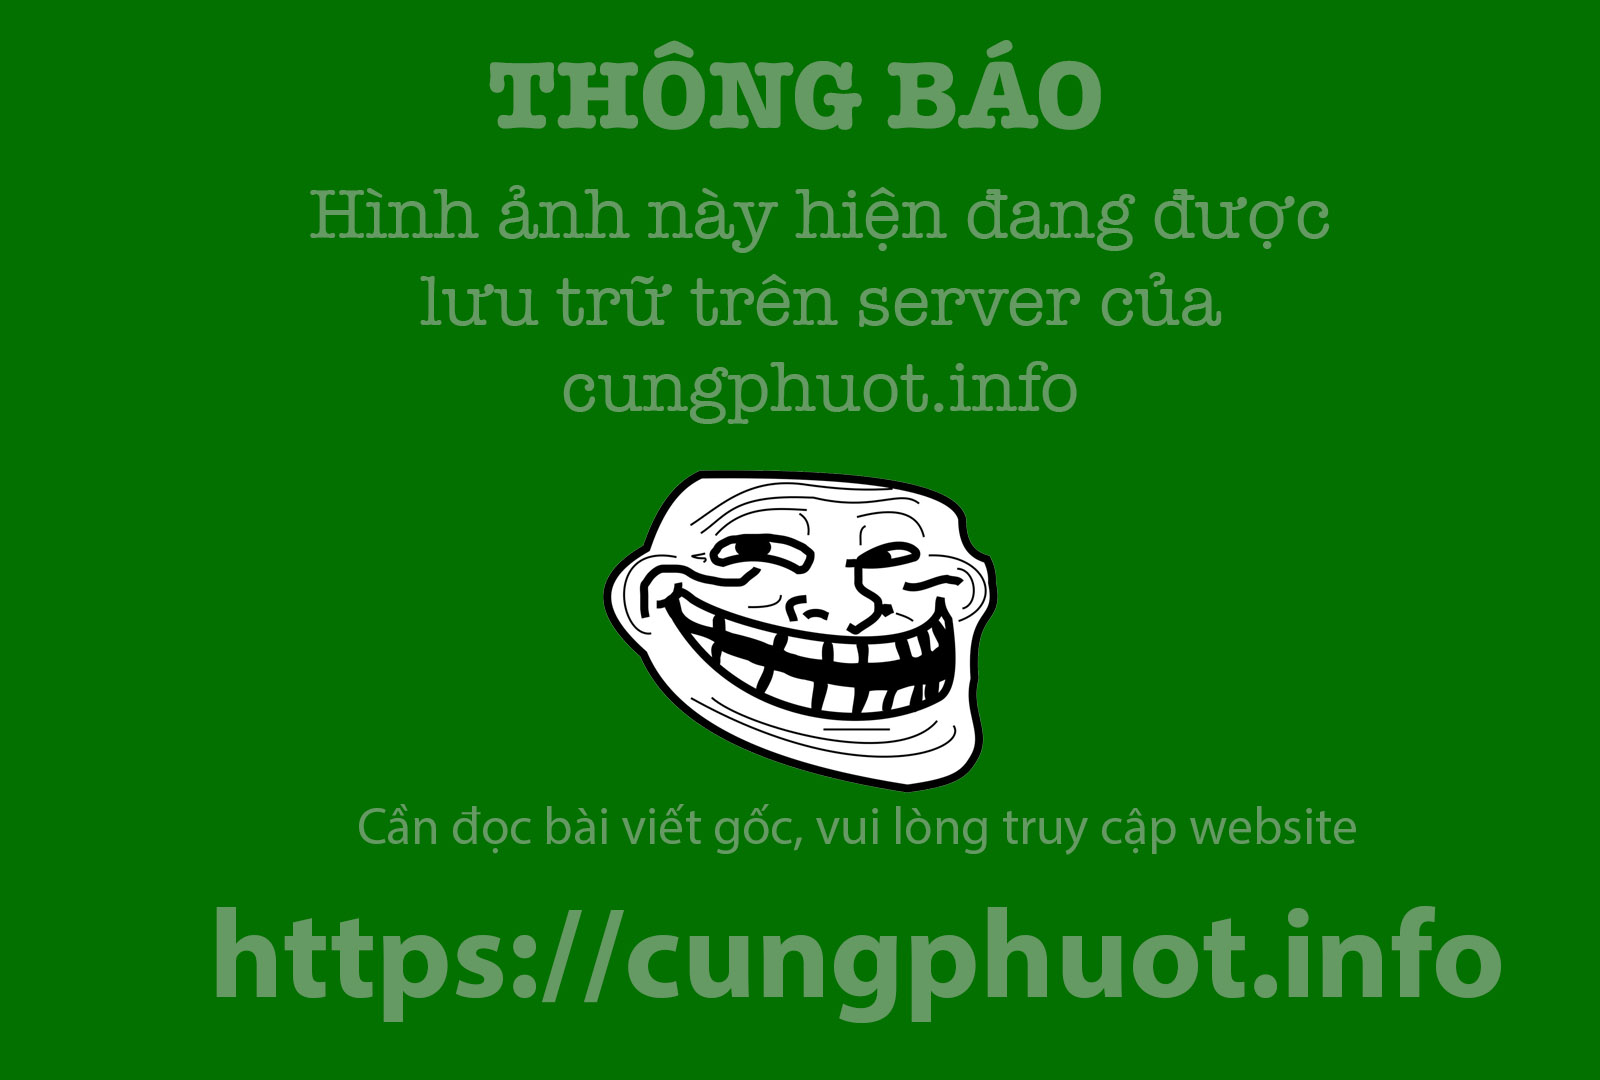 Den Moc Chau san mai anh dao hinh anh 15